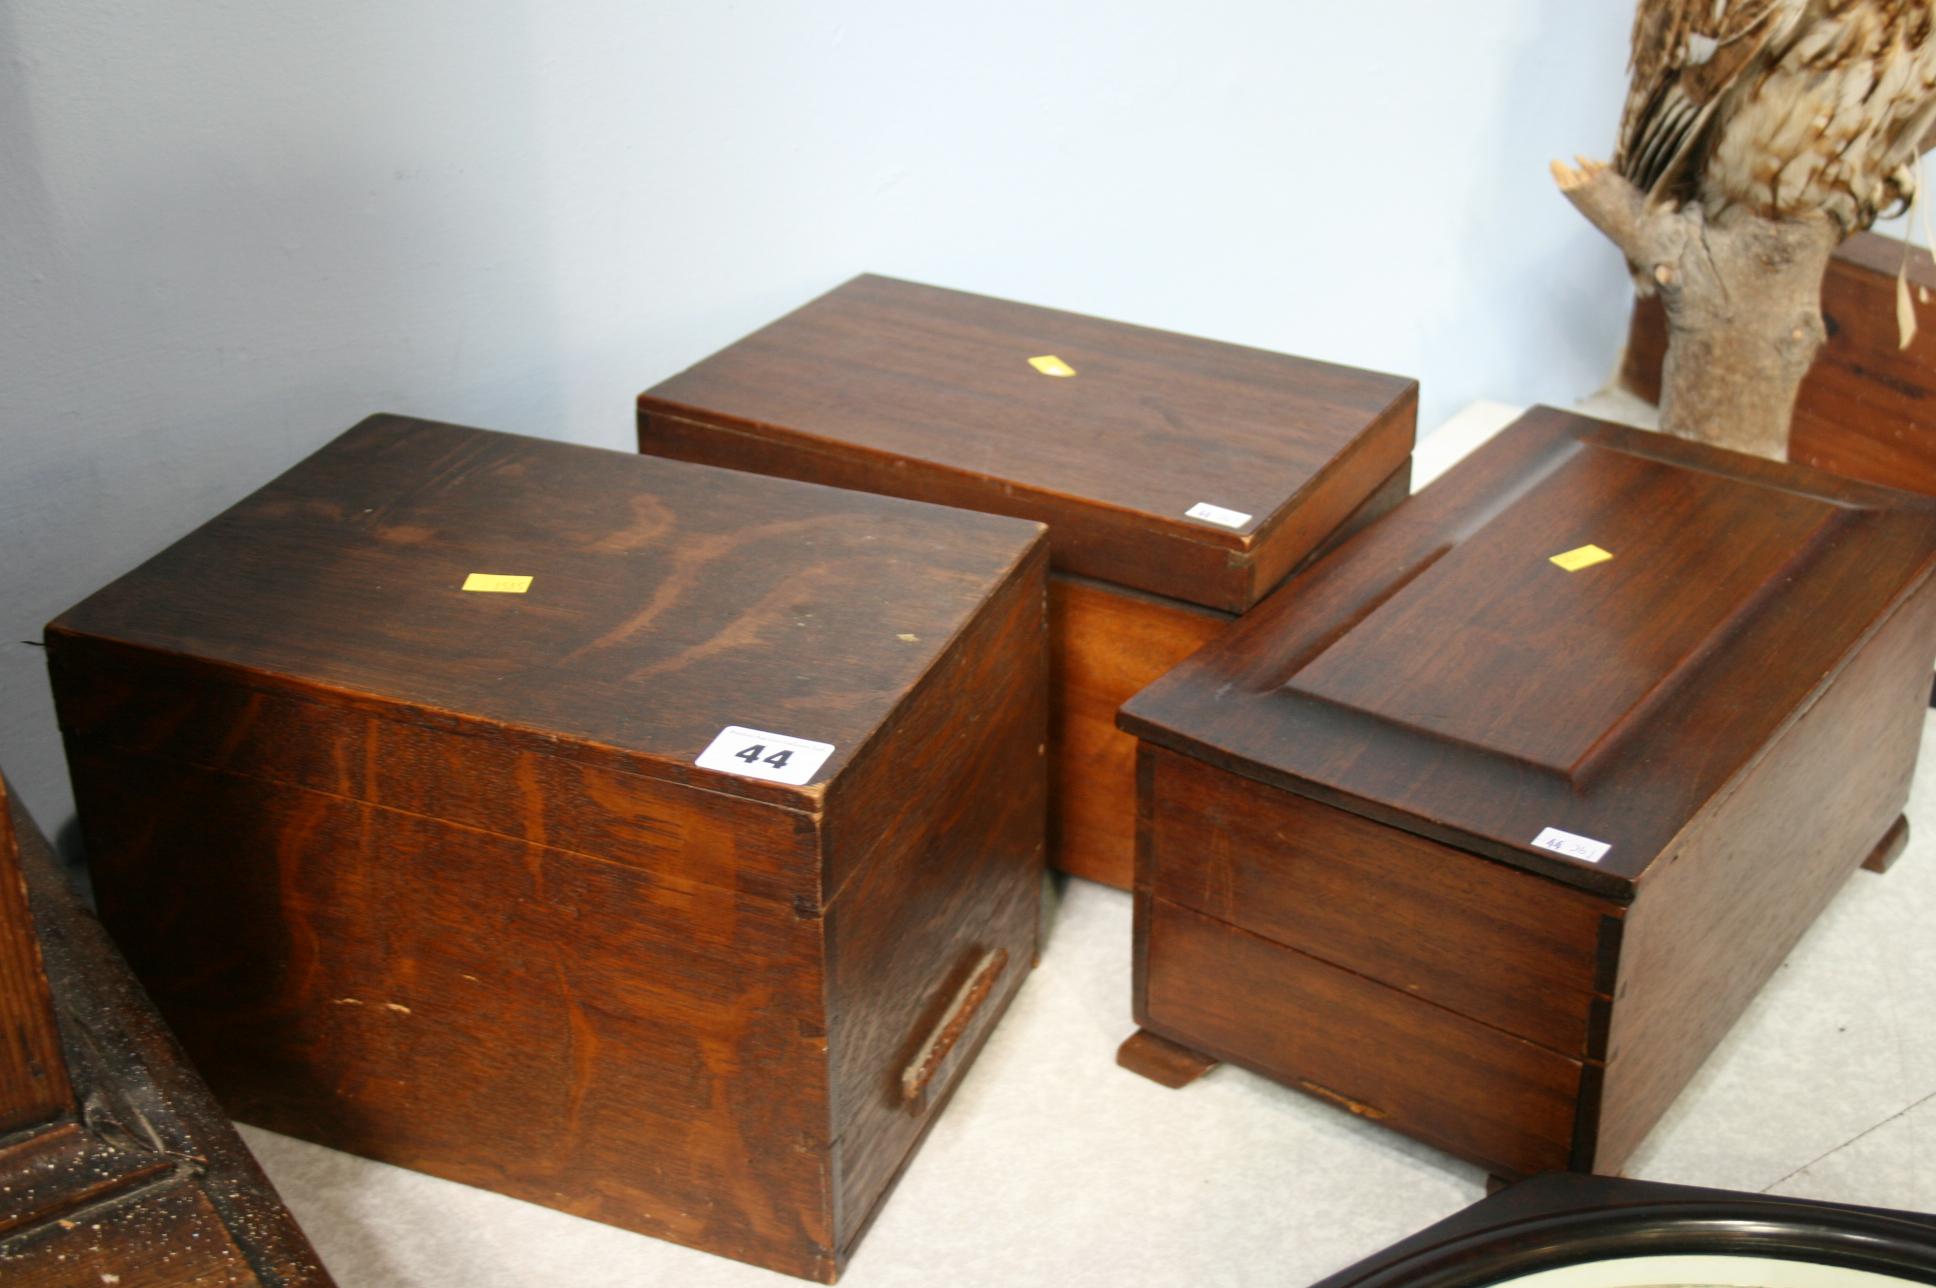 Lot 44 - Three boxes